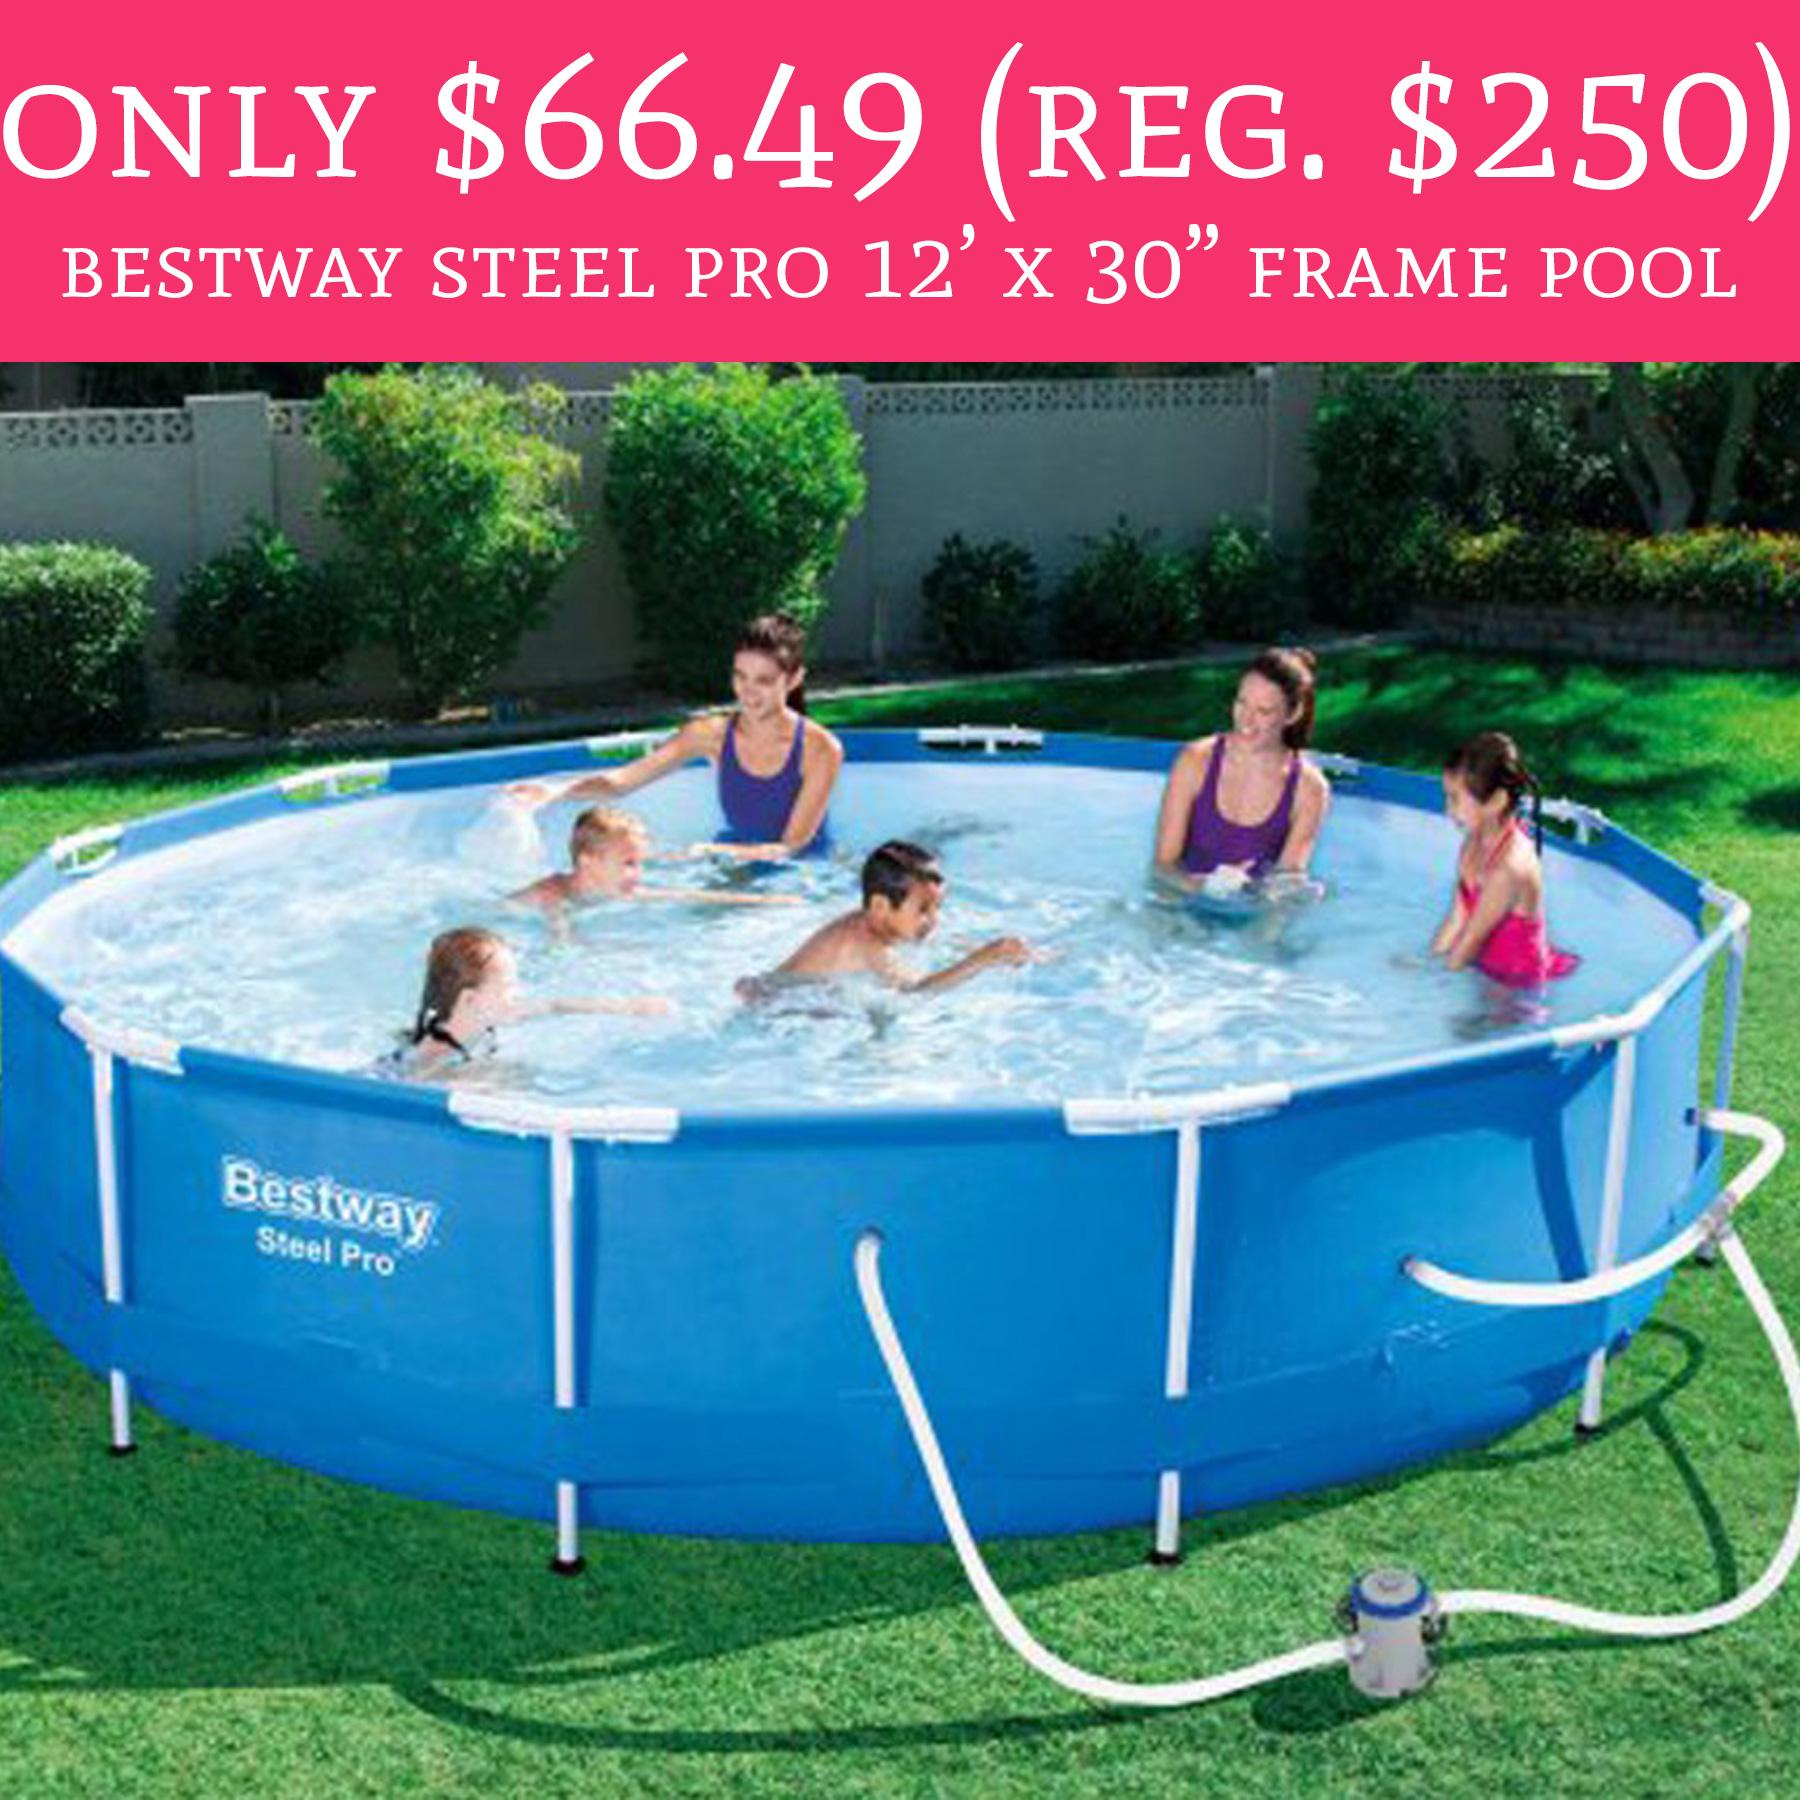 Hot only regular 250 bestway steel pro 12 39 x 30 for Bestway pools for sale